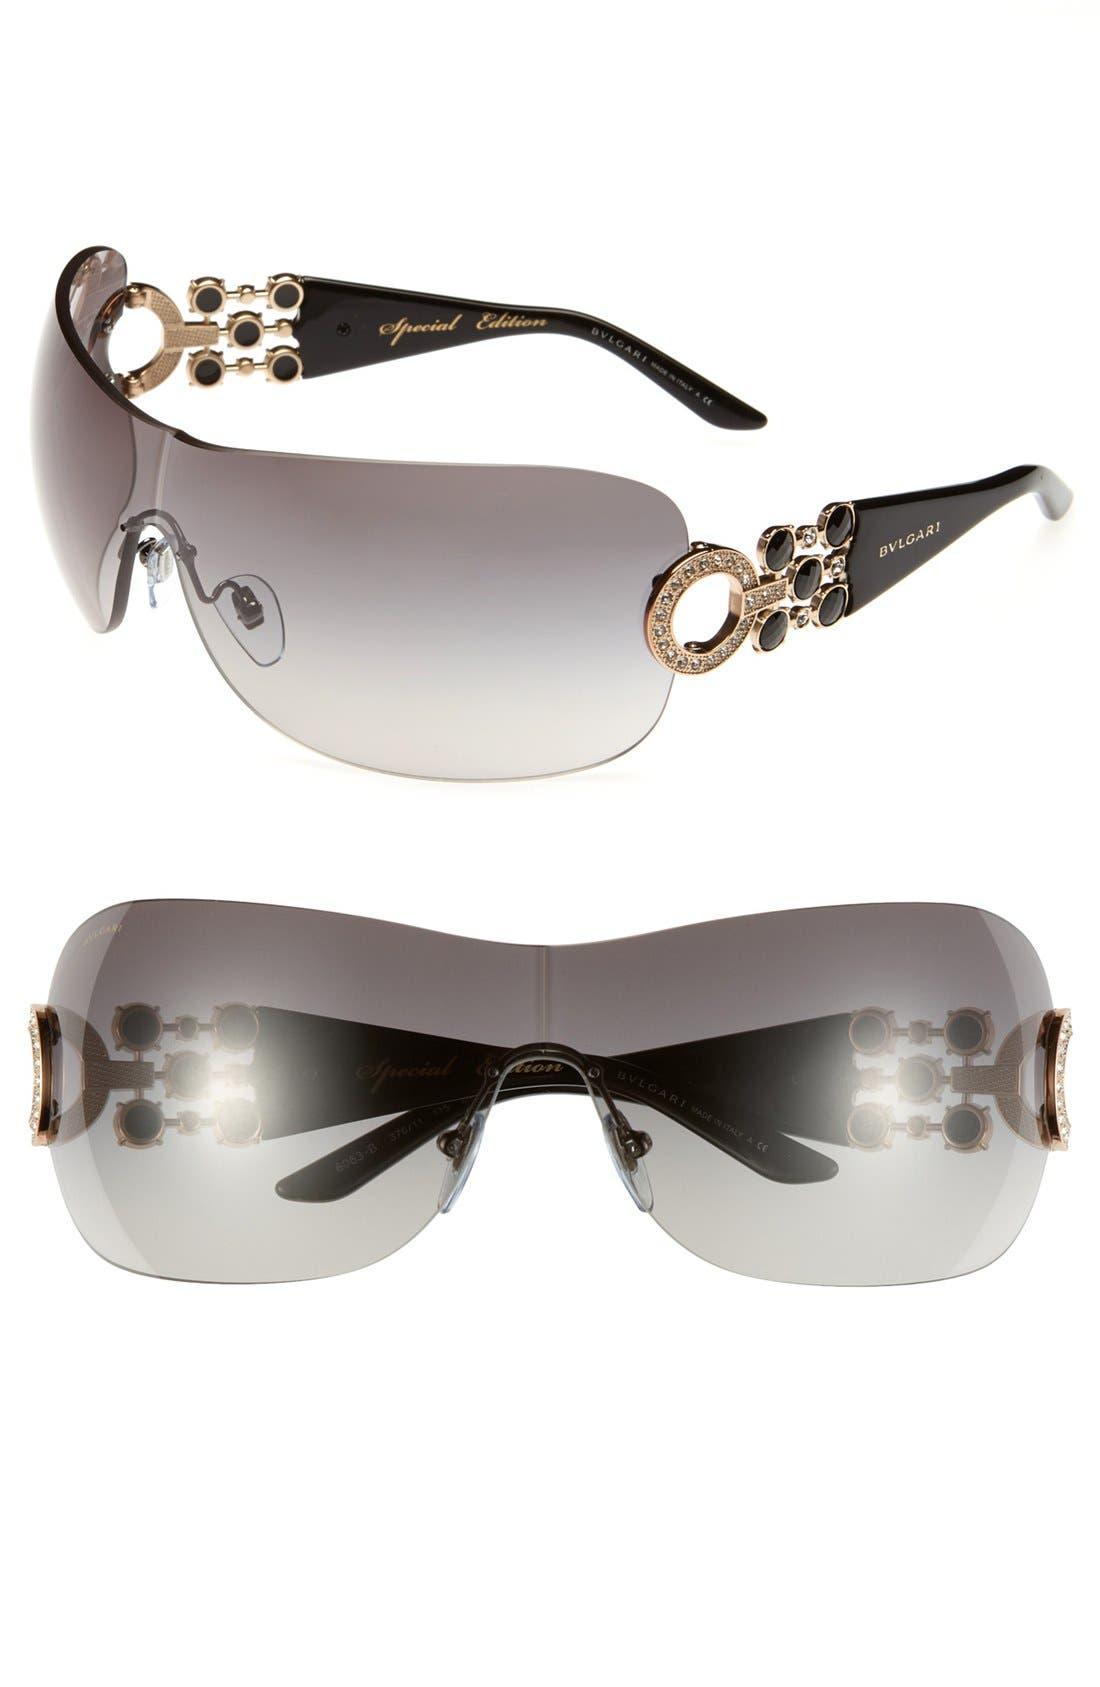 Main Image - BVLGARI 37mm Embellished Temple Rimless Shield Sunglasses